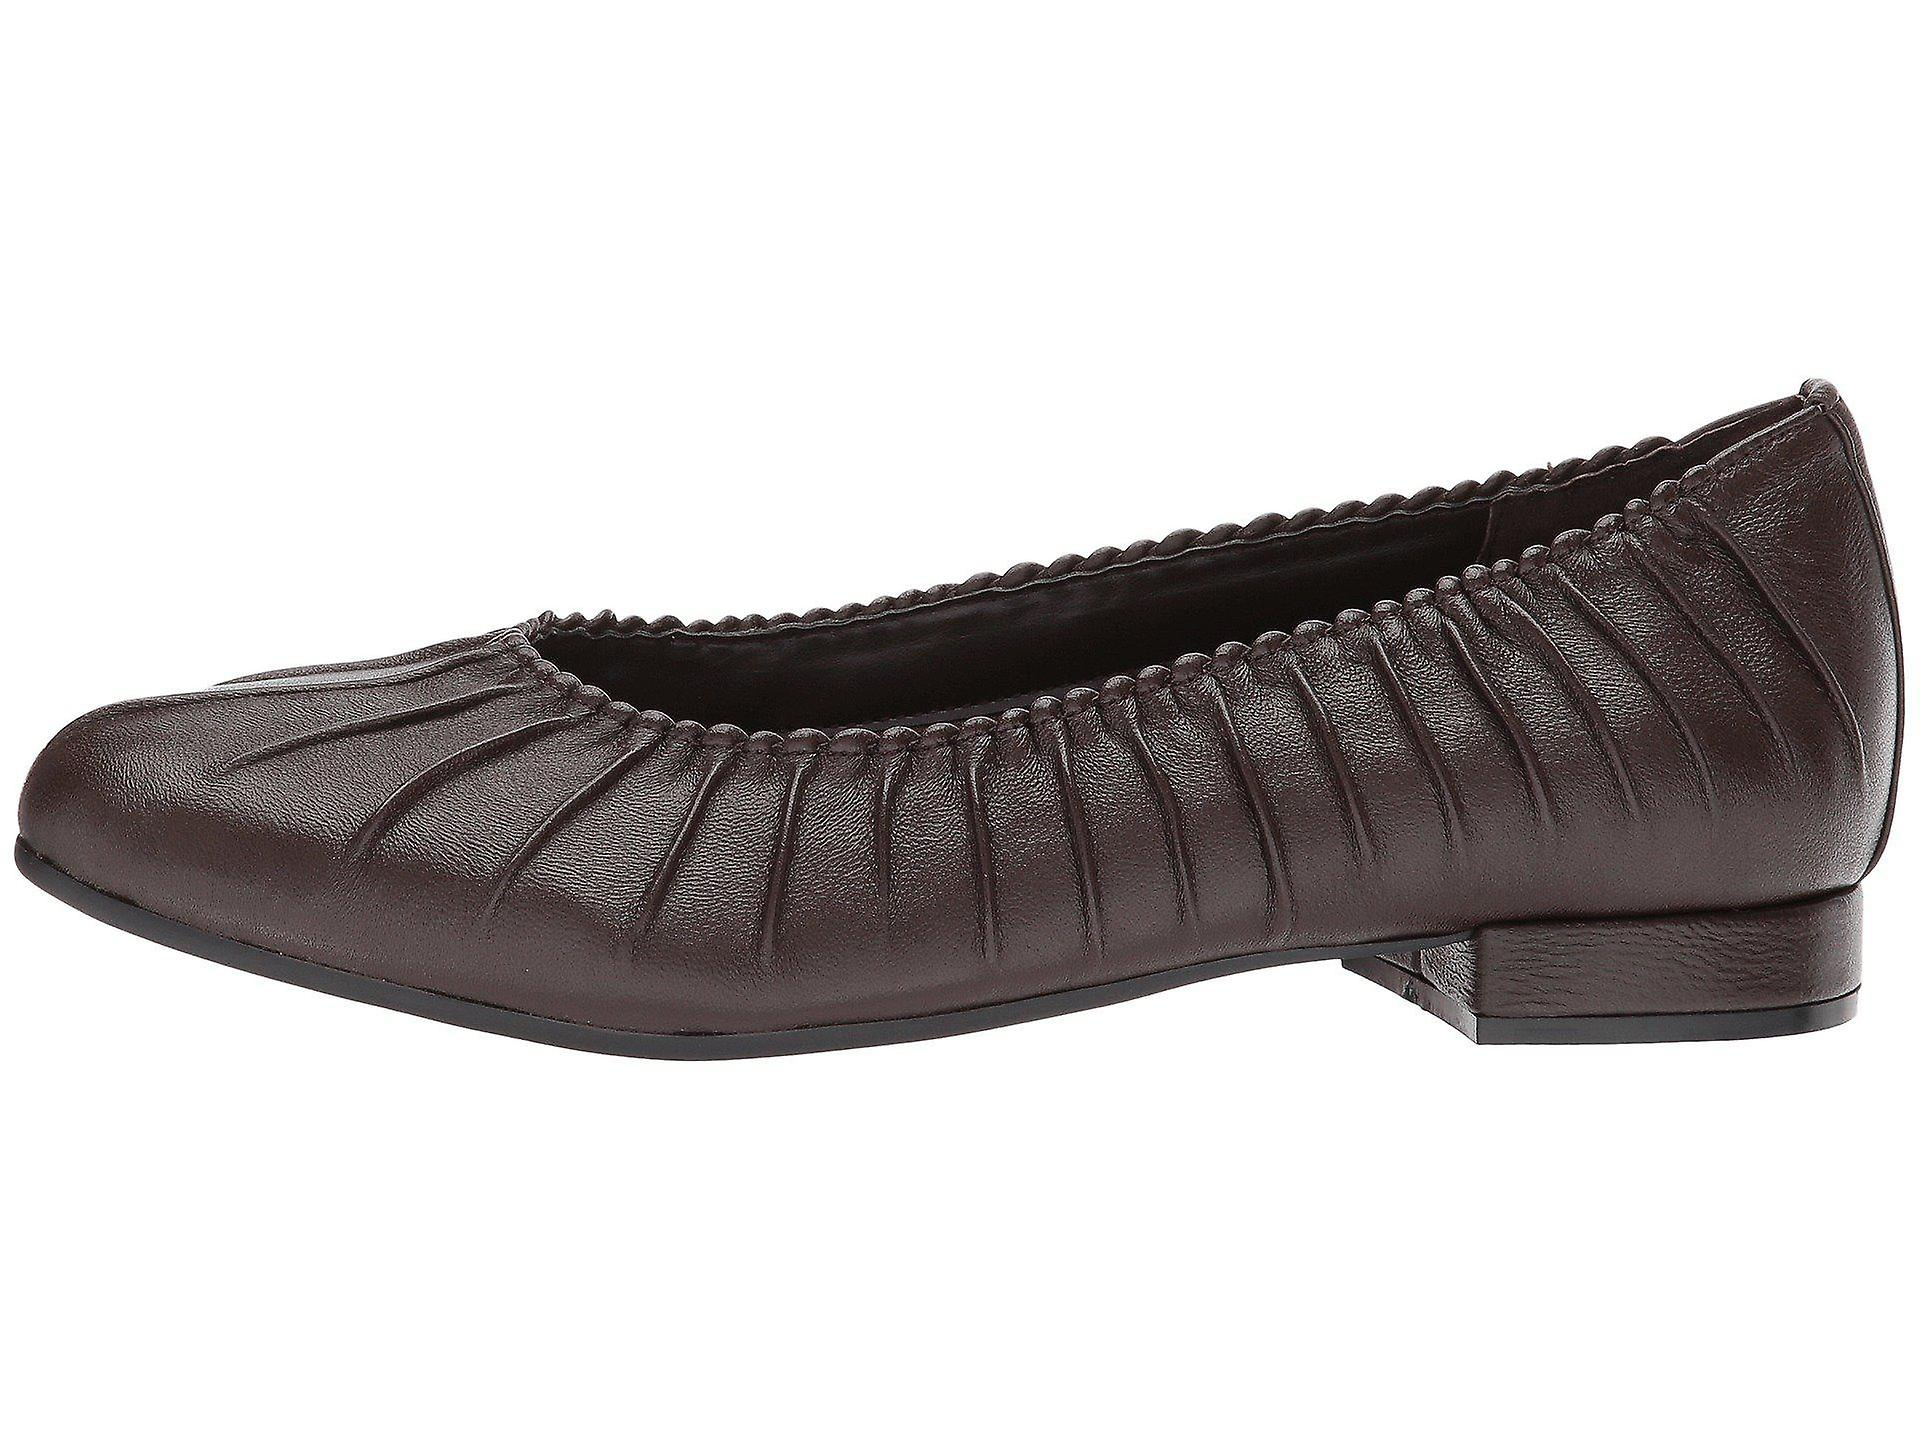 David Tate Womens Santo Leather Closed Toe Casual Slide Sandals